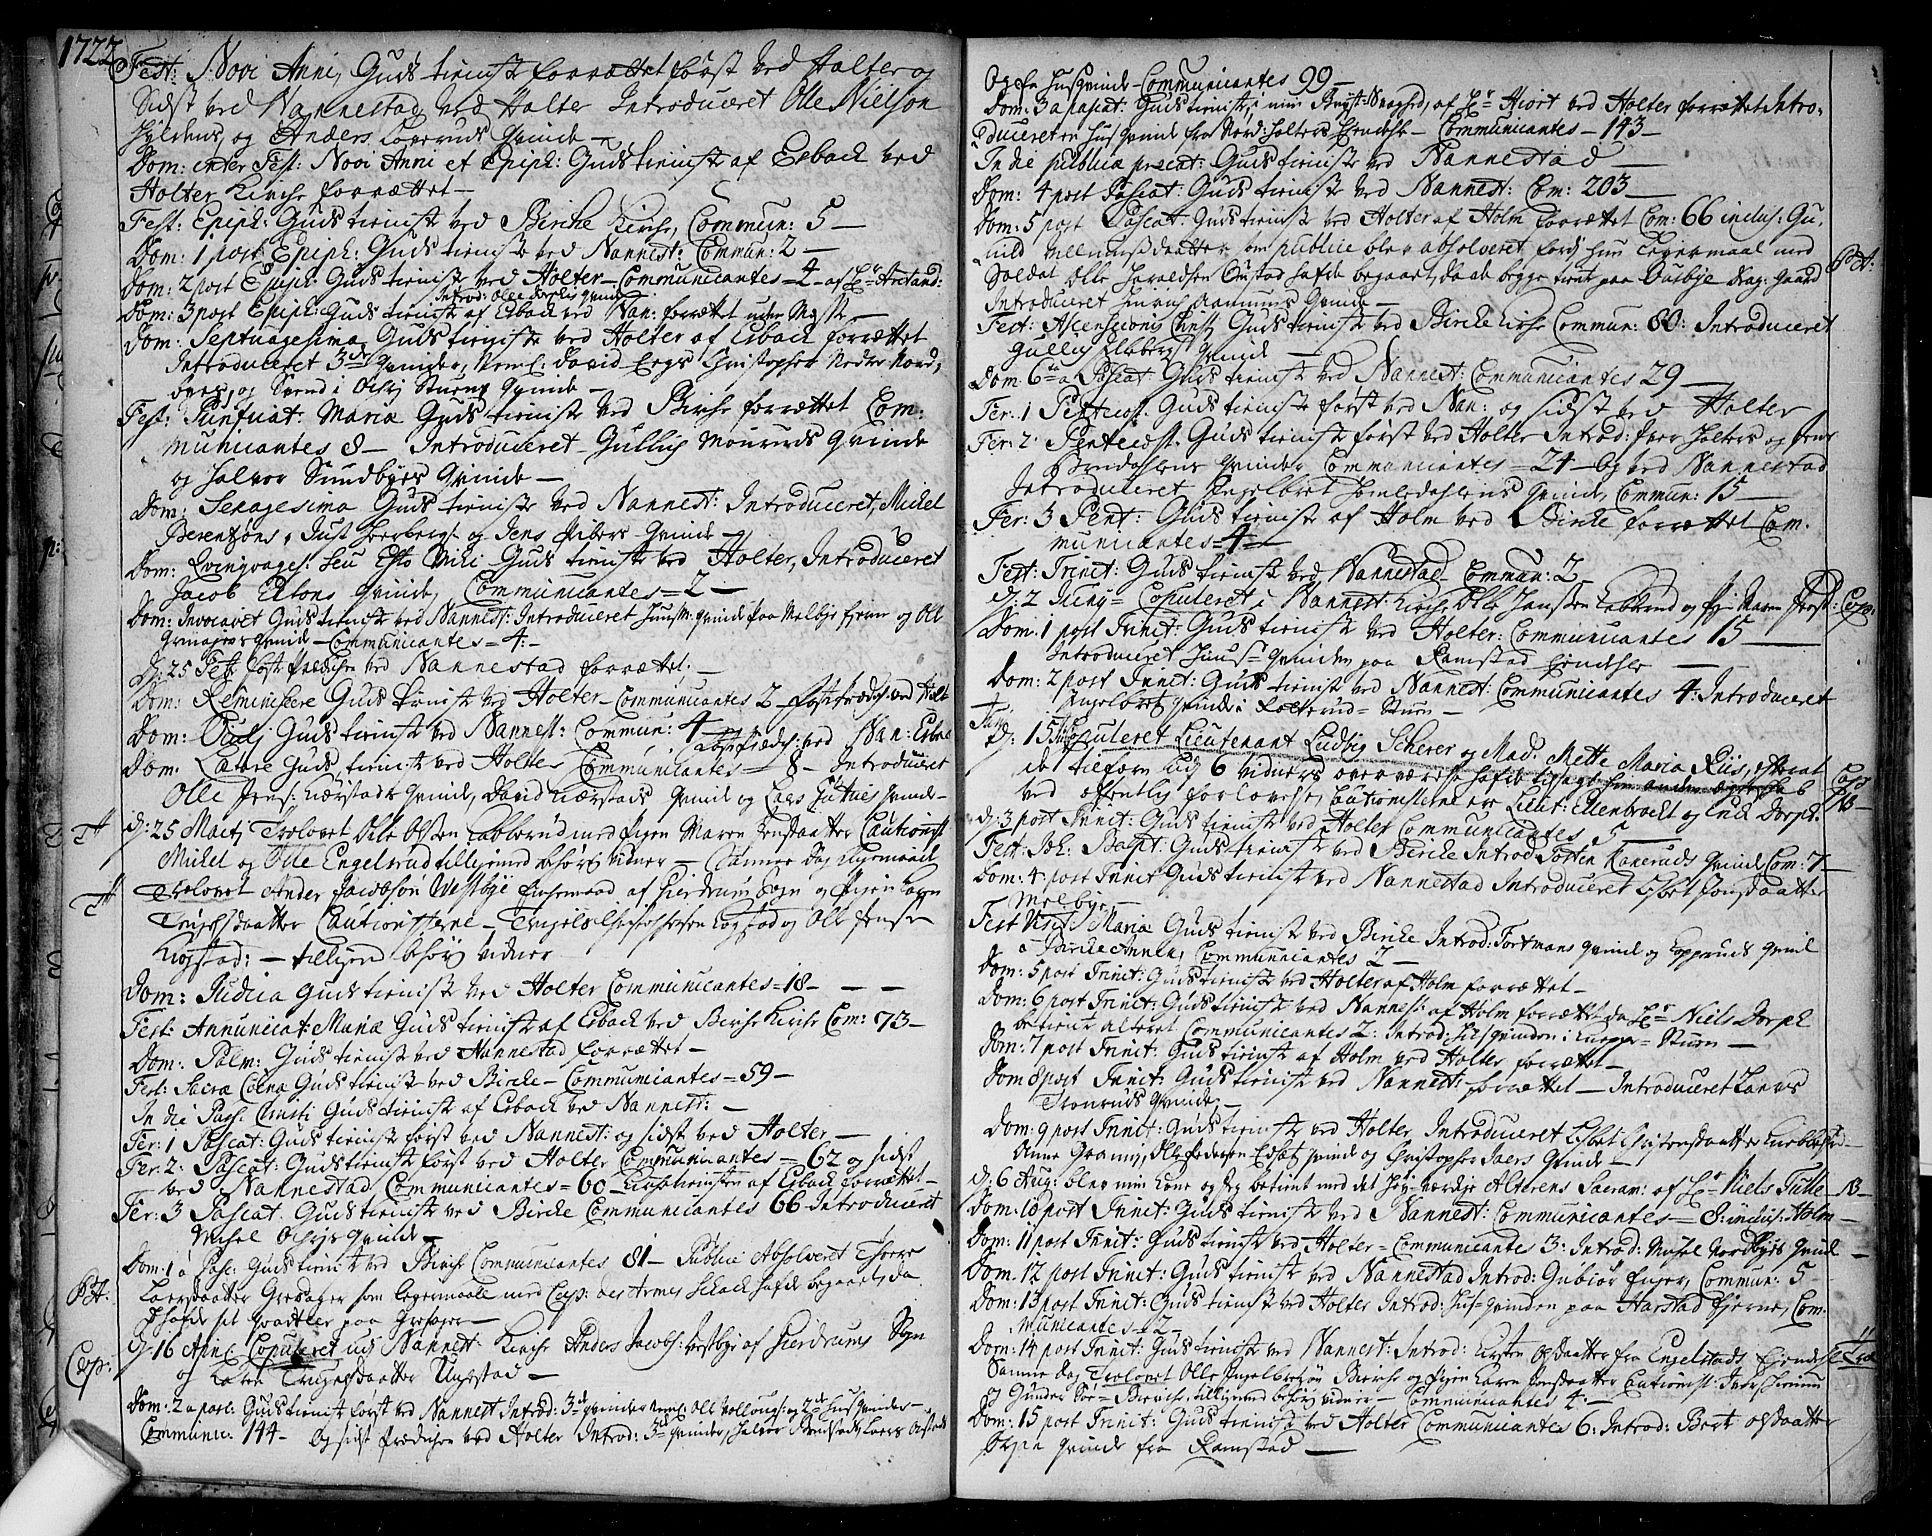 SAO, Nannestad prestekontor Kirkebøker, F/Fa/L0004: Ministerialbok nr. I 4, 1716-1753